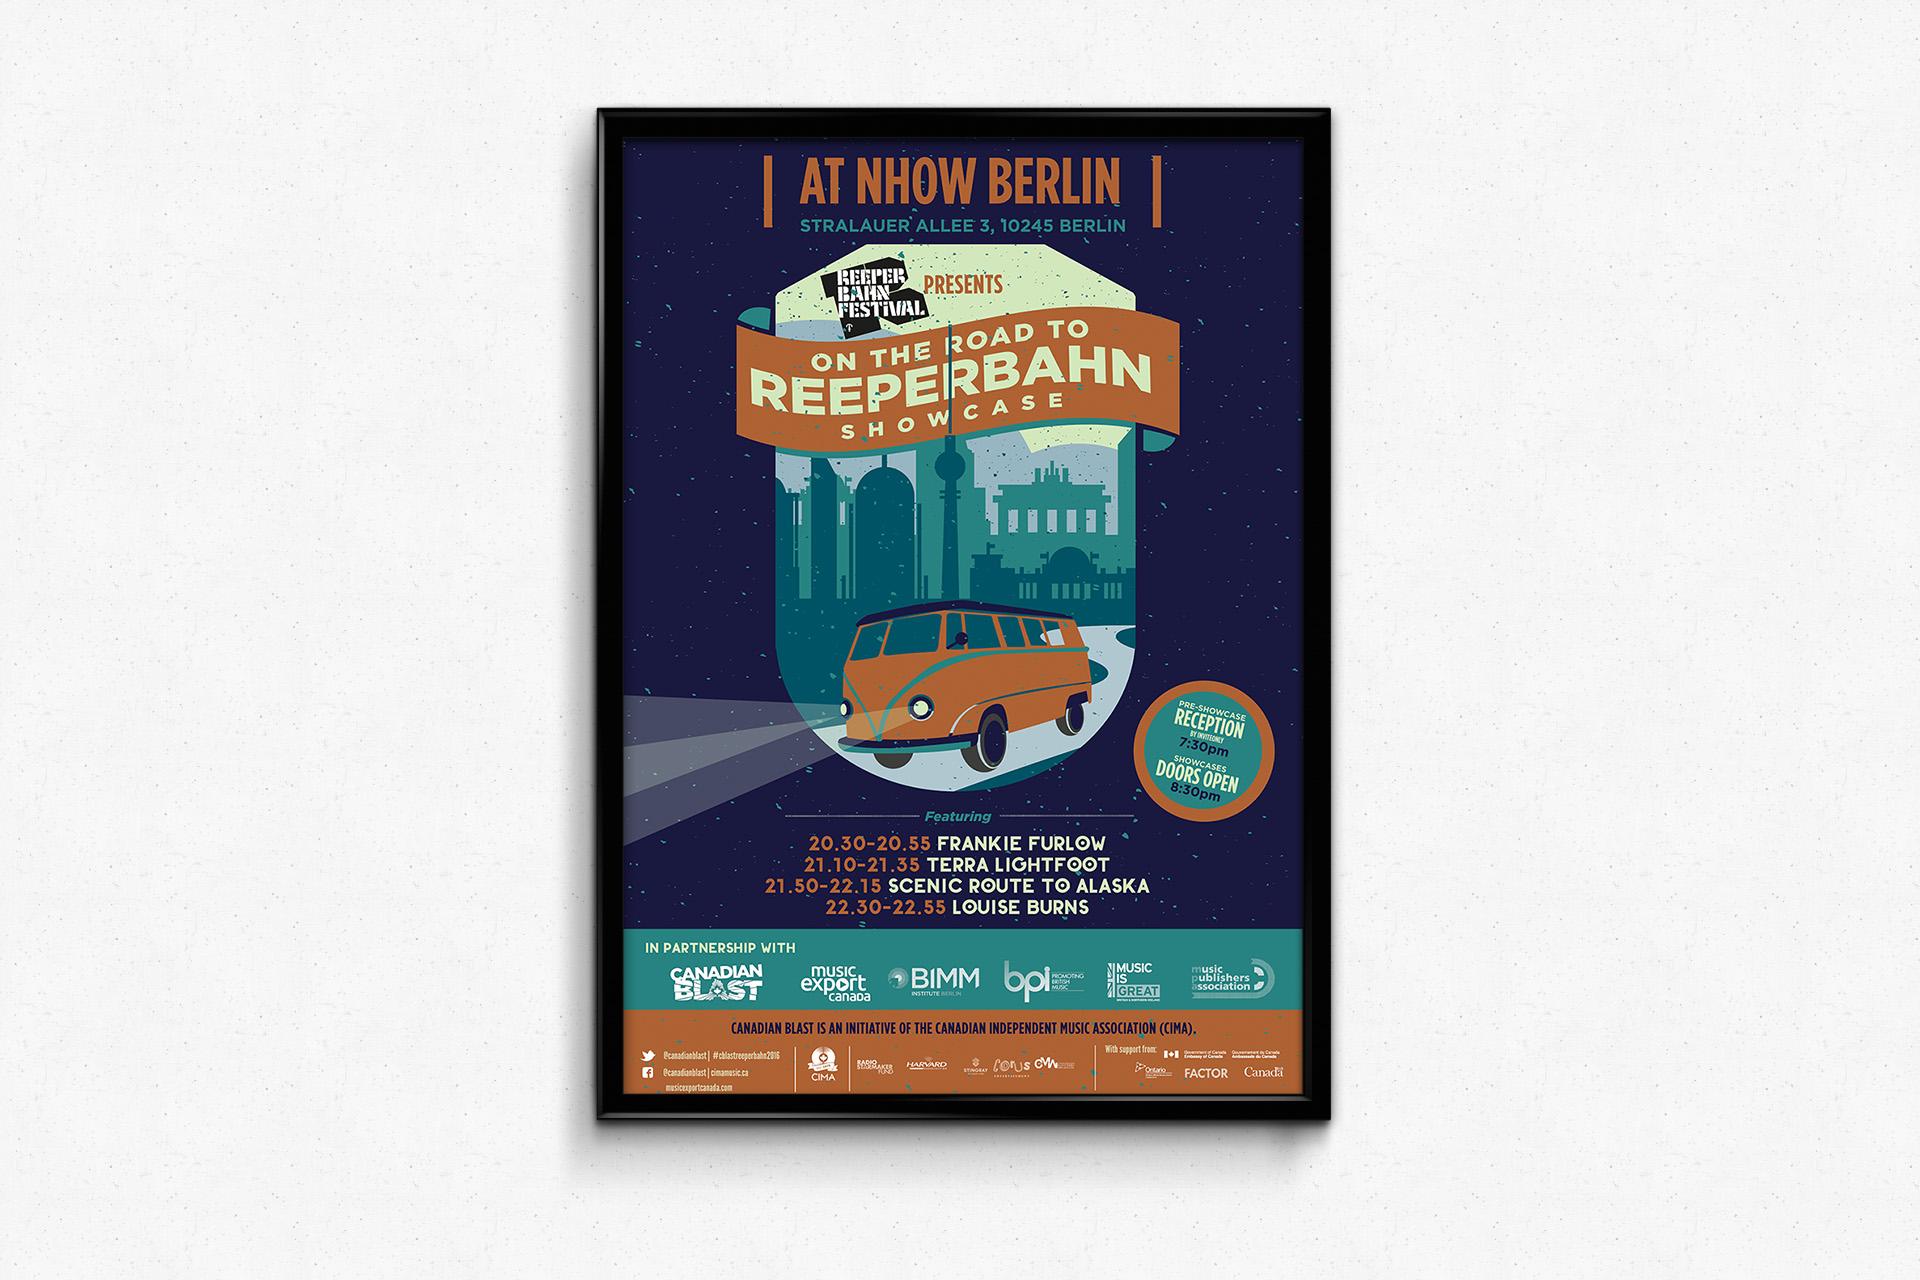 On The Road To Reeperbahn Showcase